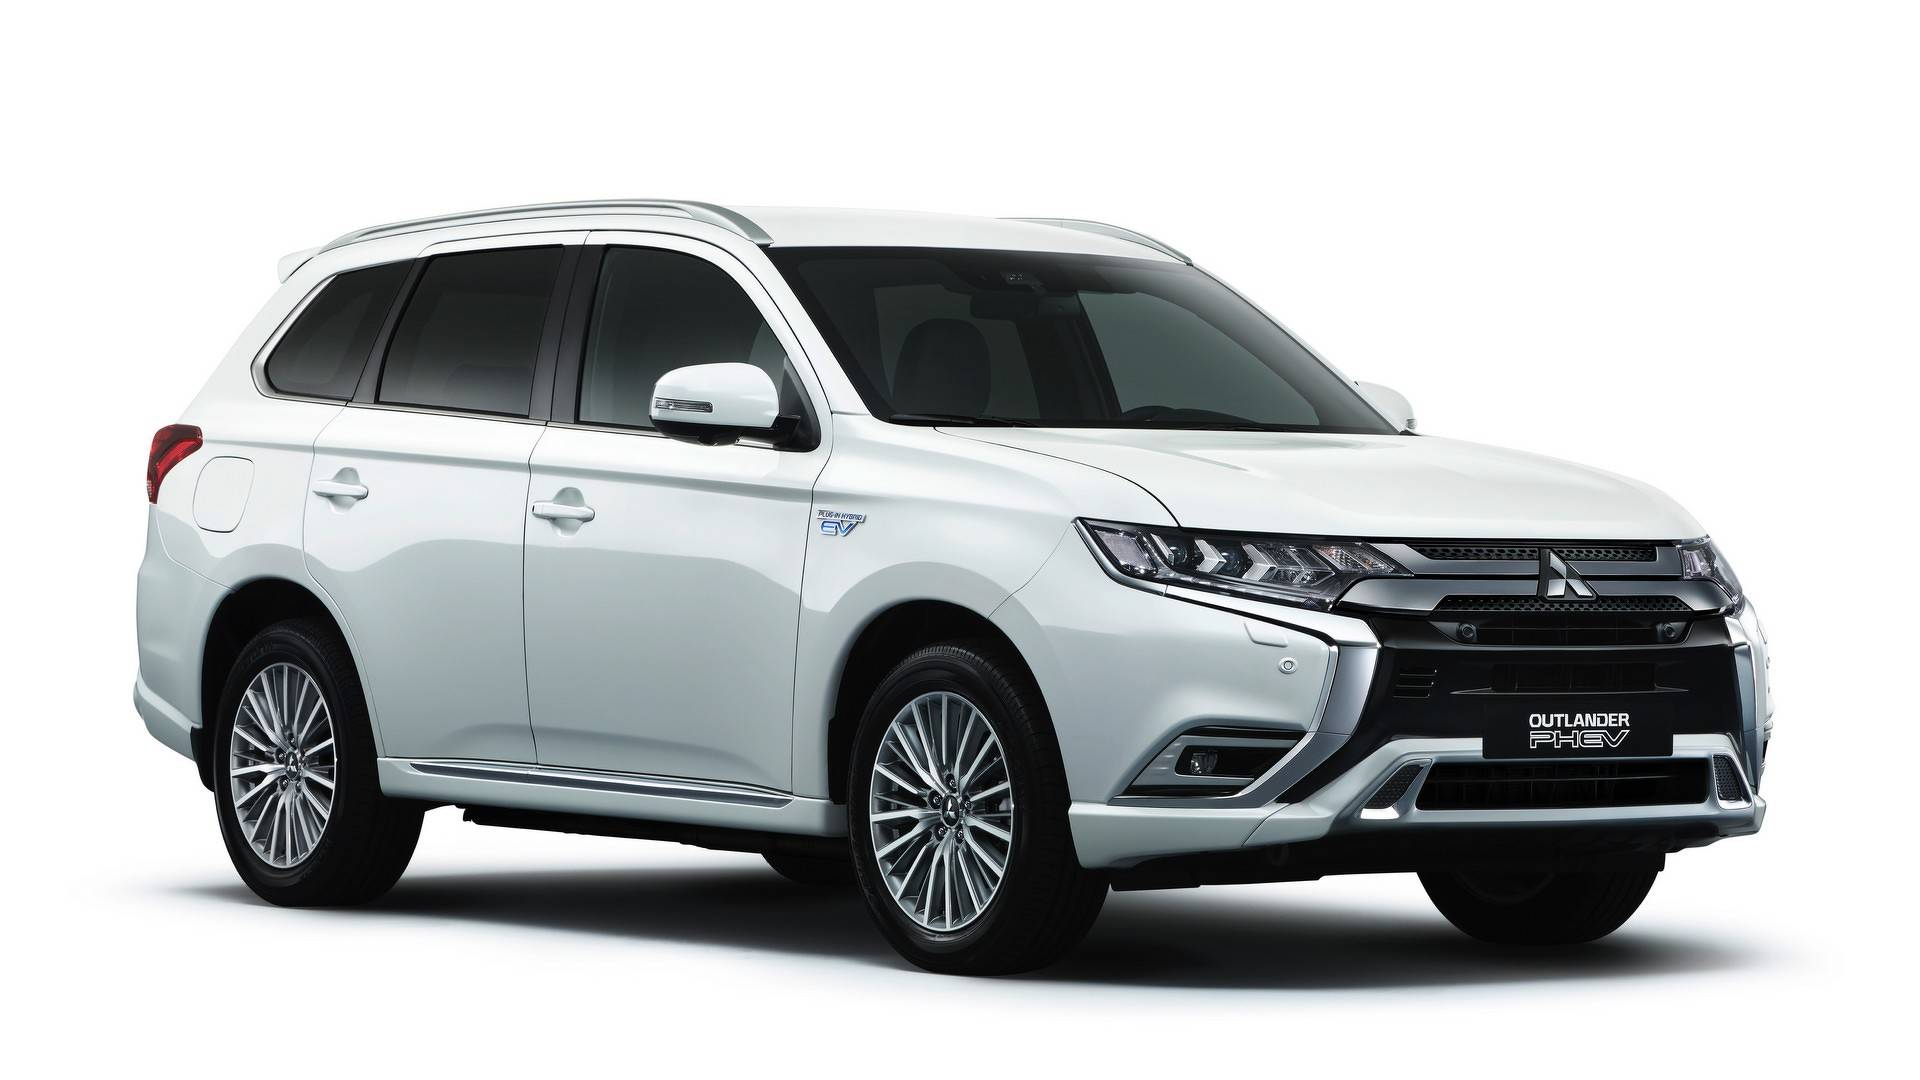 2019 Mitsubishi Outlander Phev Revealed Autodevot